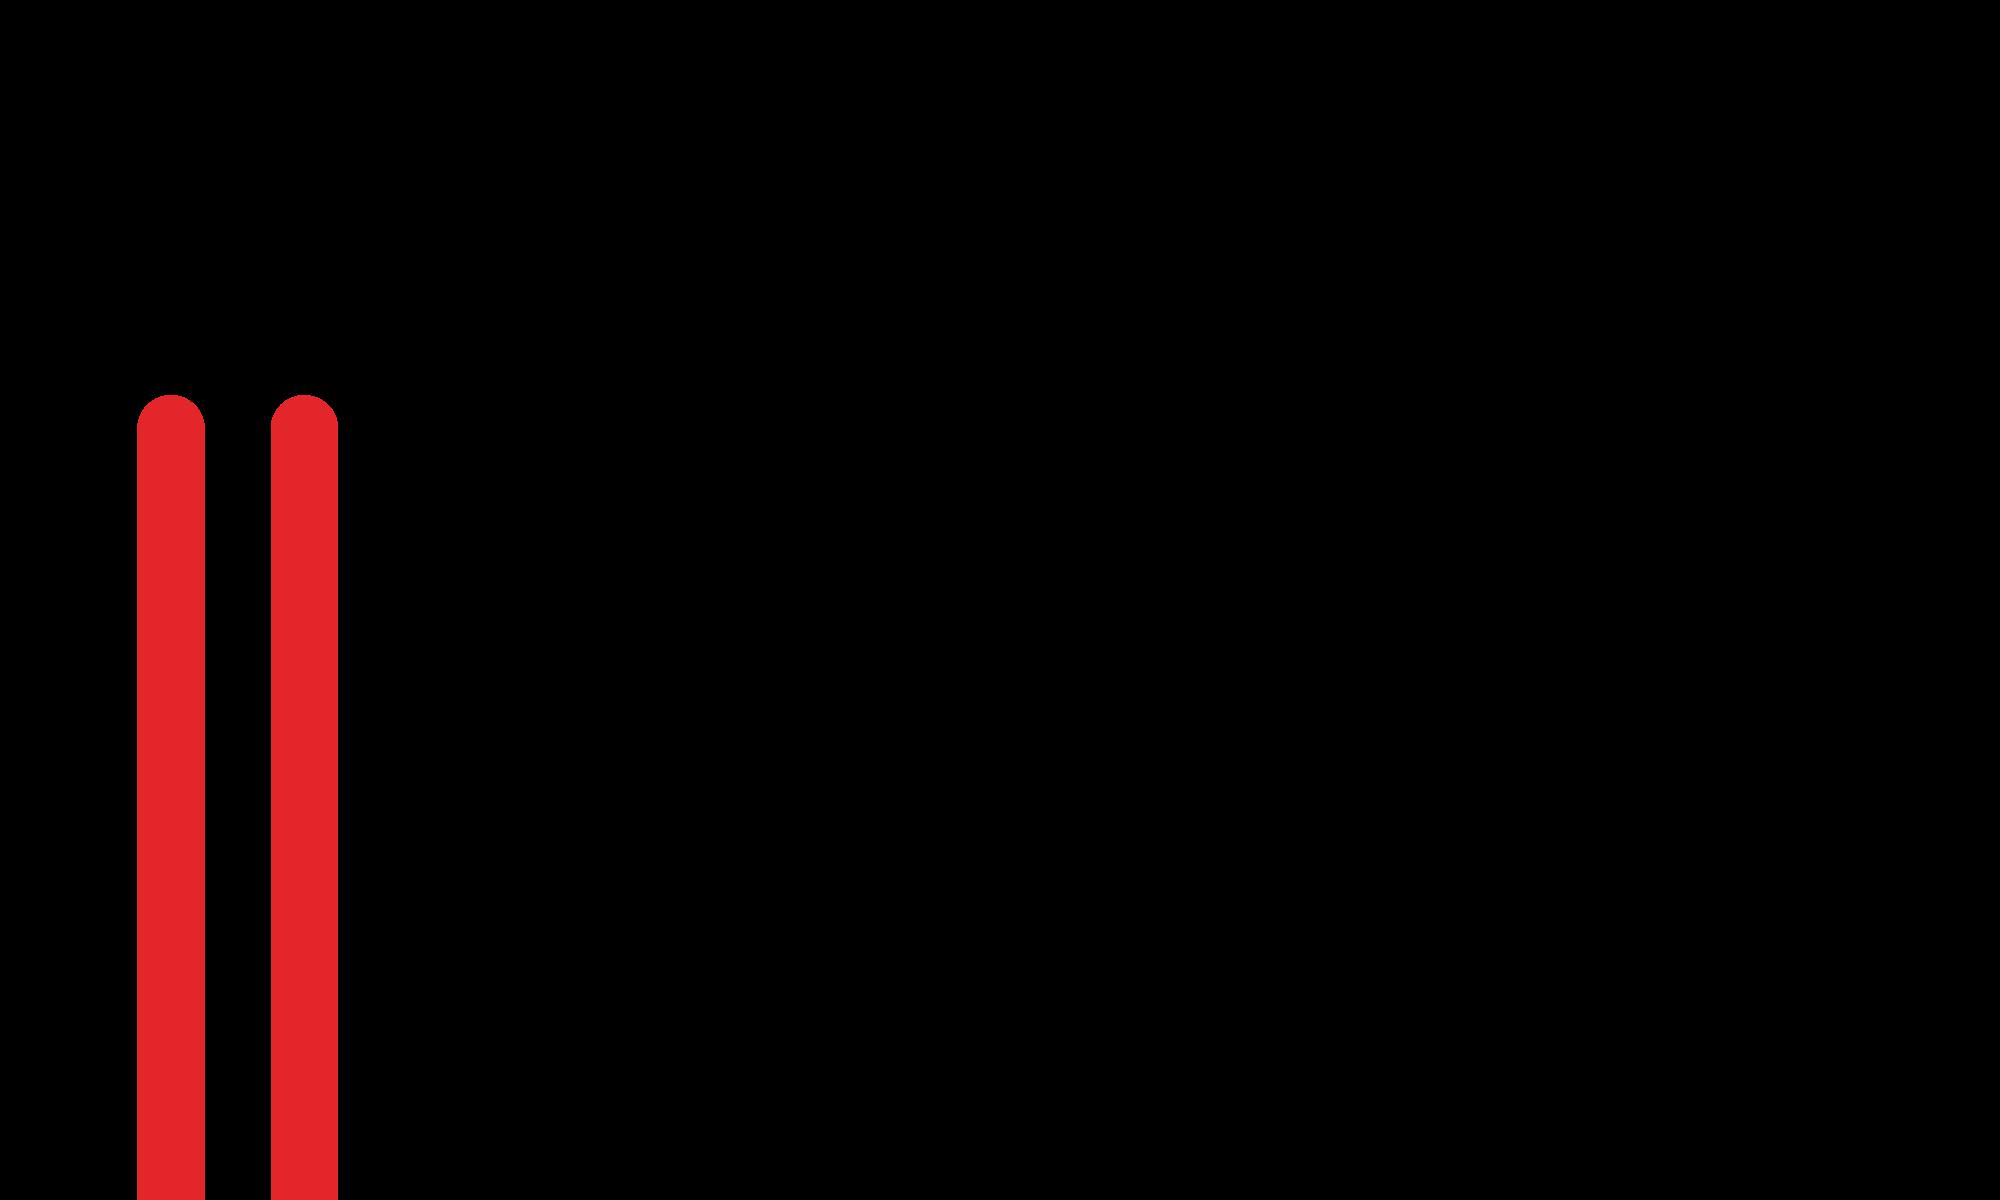 Plesk Logo Picture PNG Image - Plesk Logo PNG